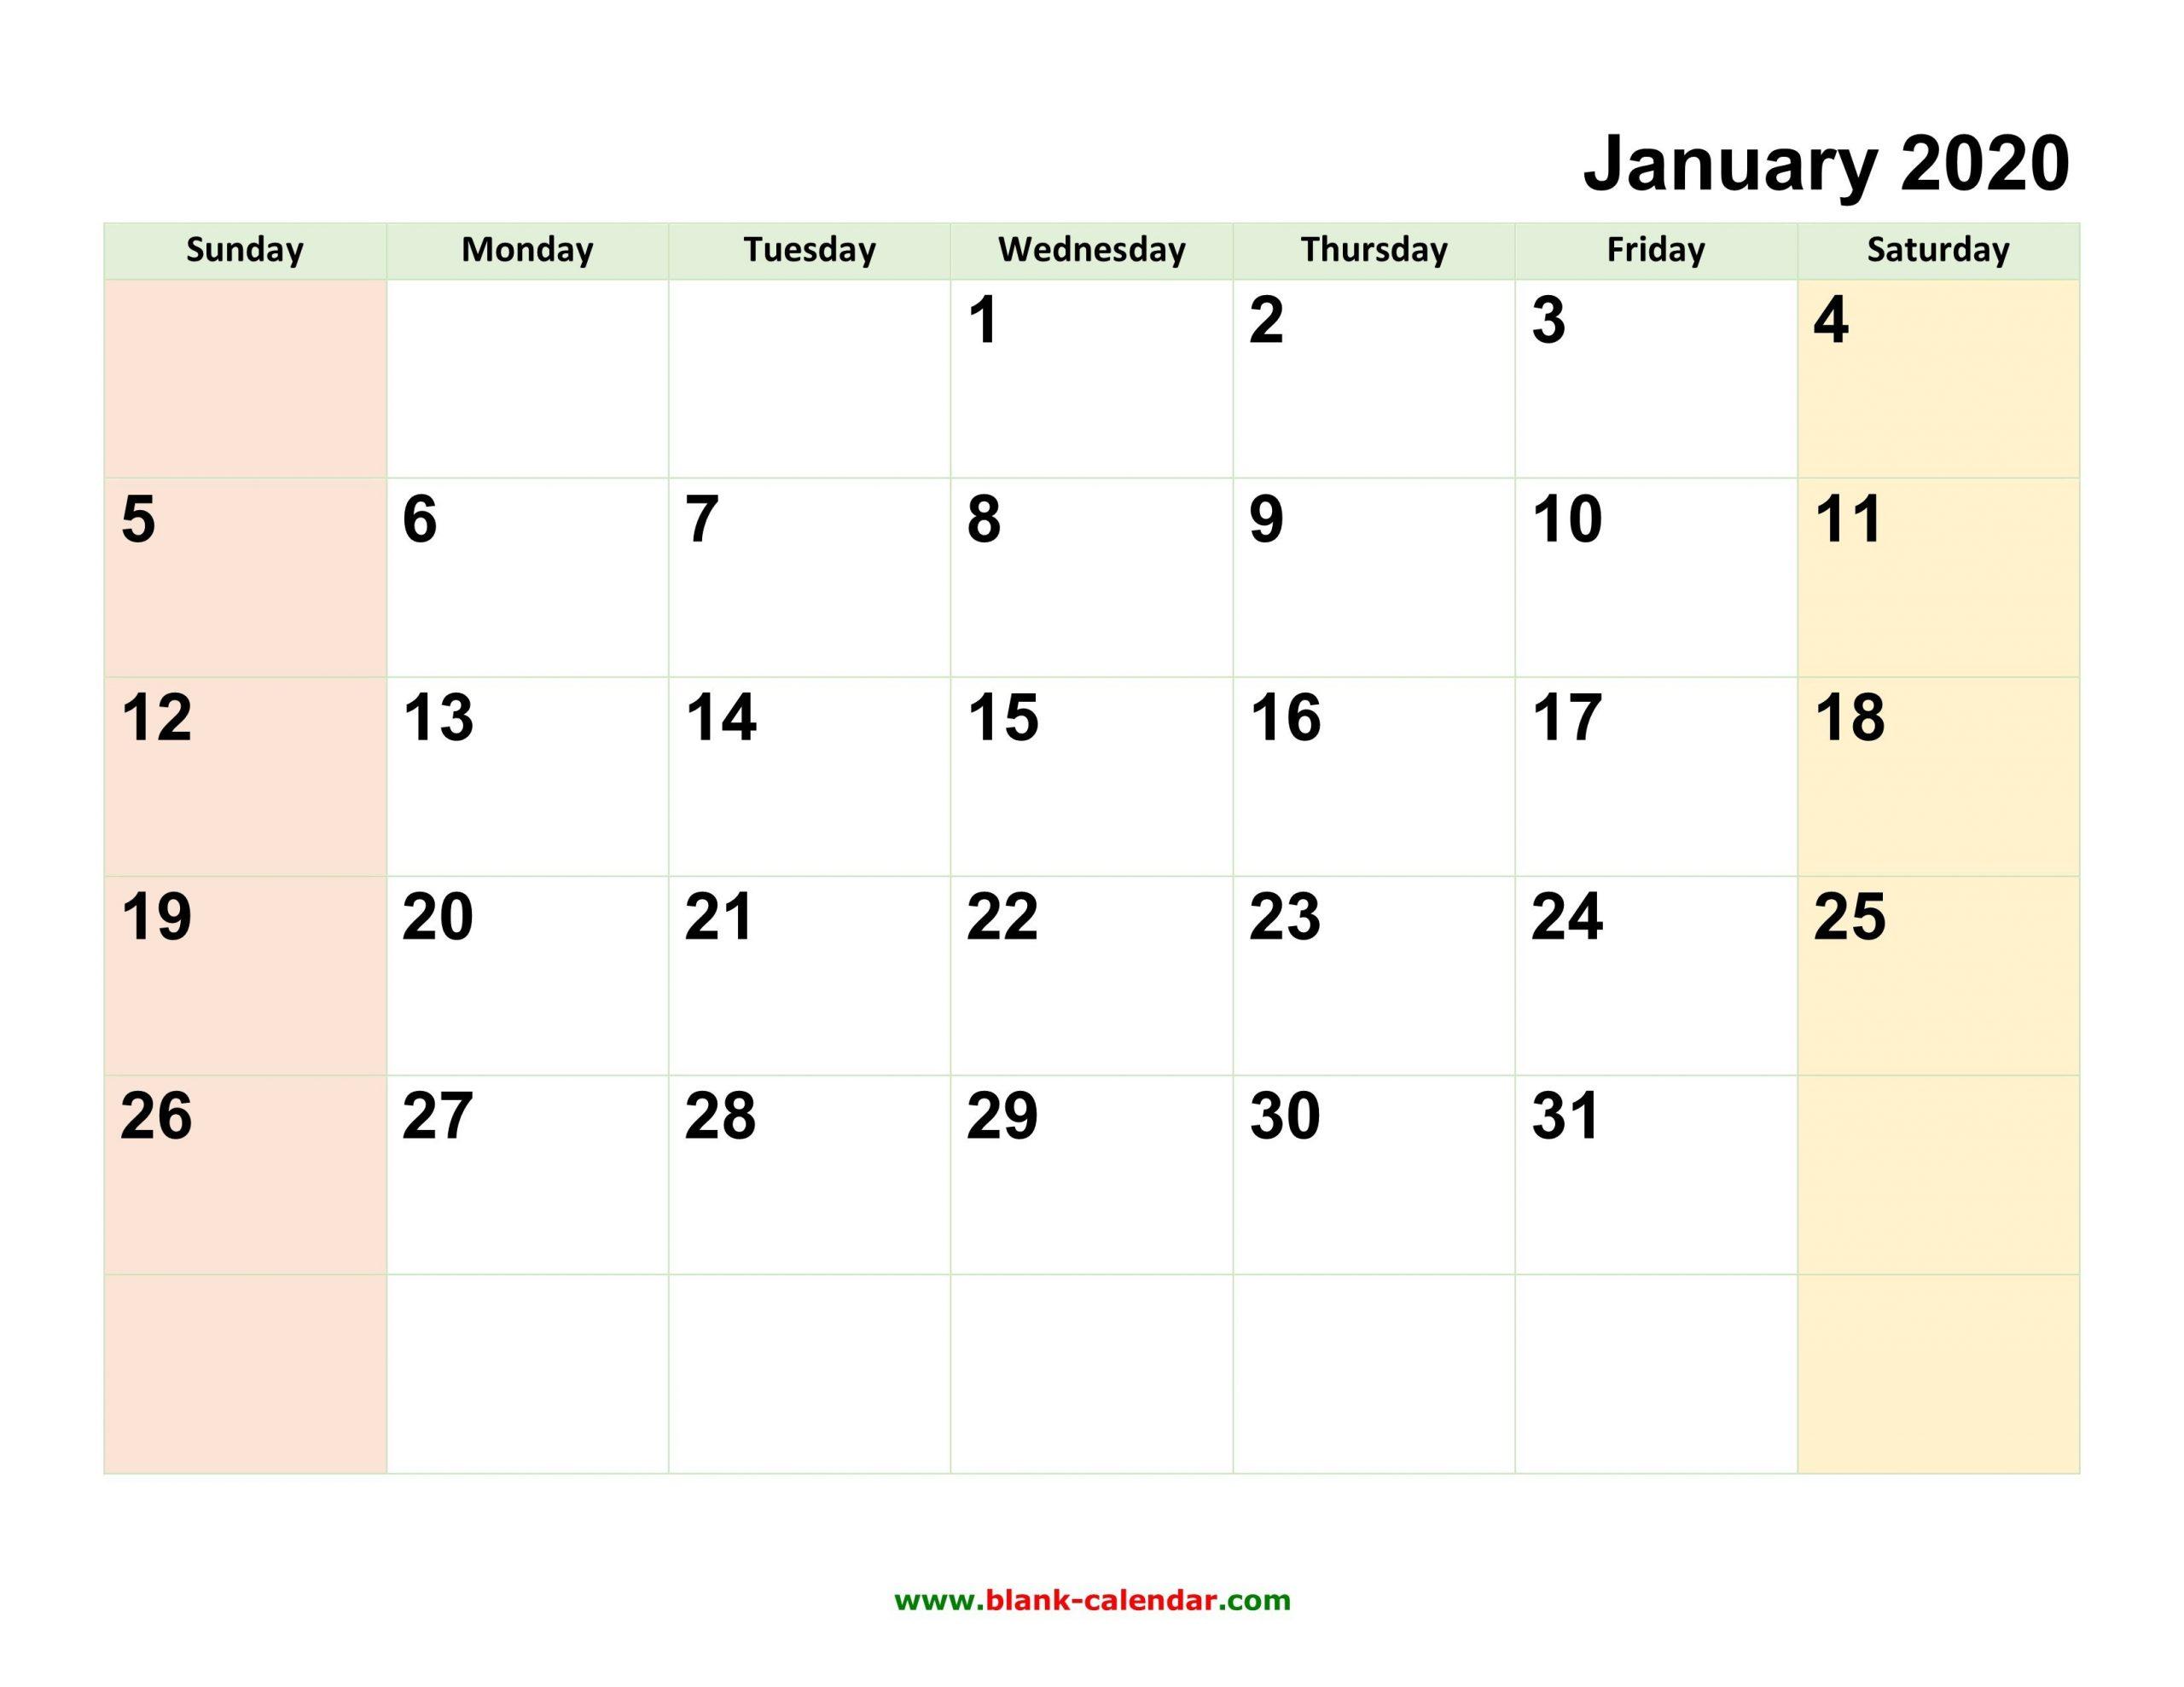 Free Weekly Calander That You Can Edit : Free Calendar Editable 2 Week Calendars